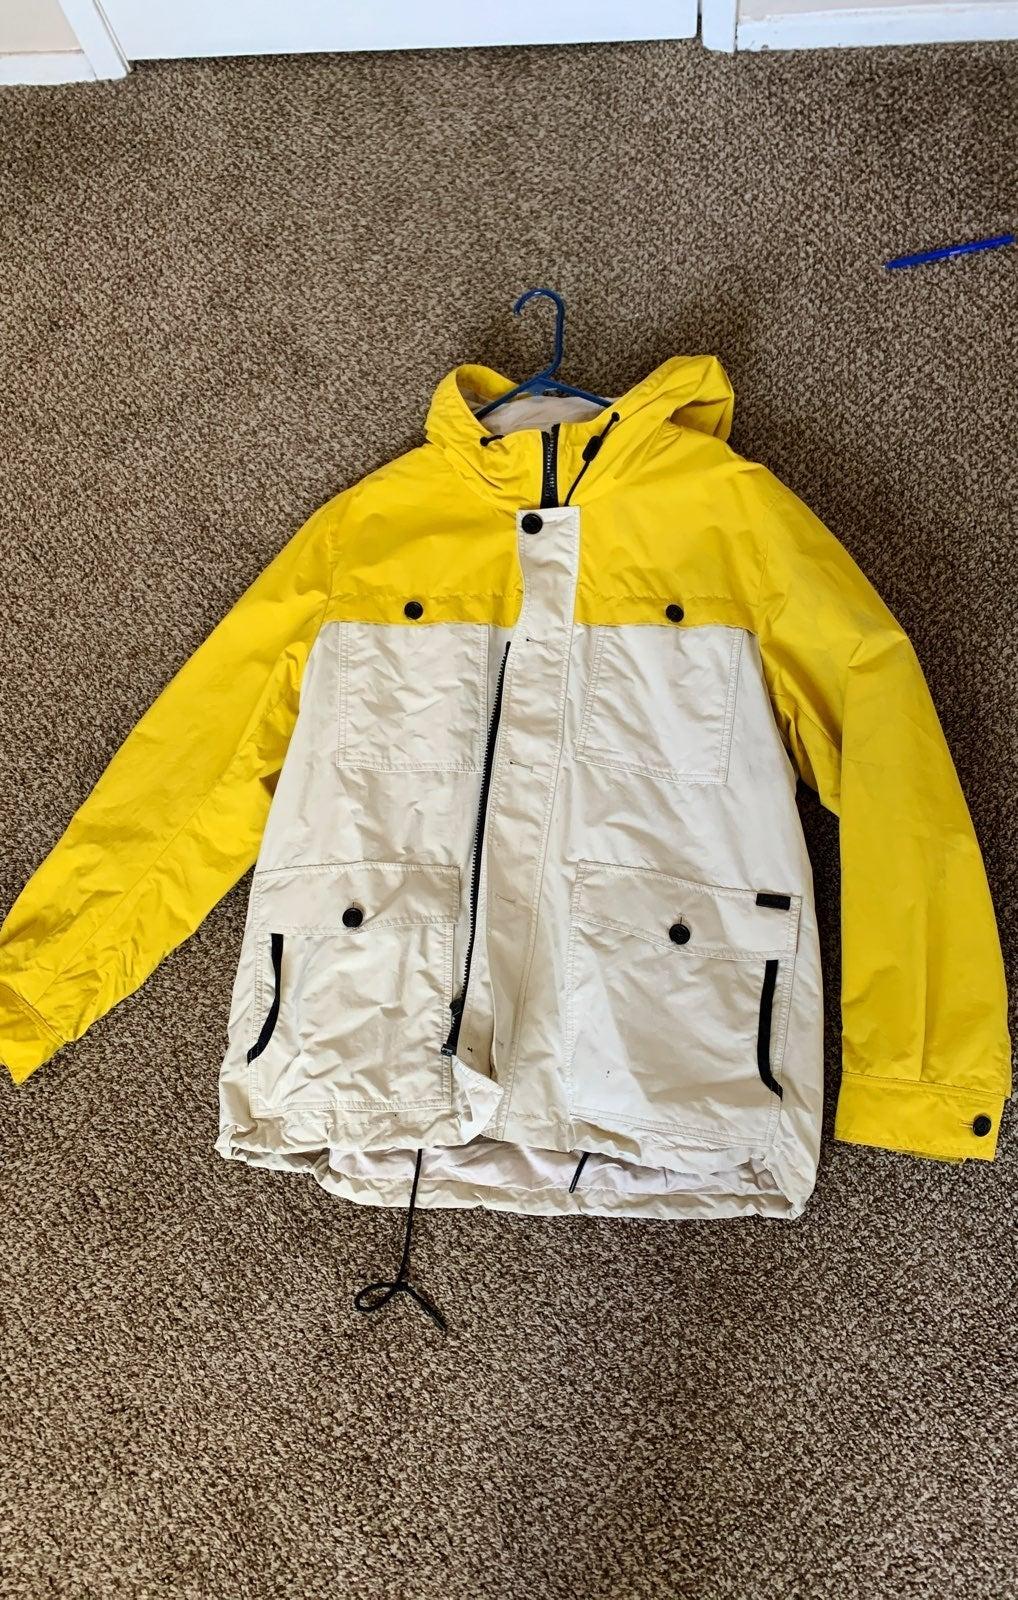 Coach sailing jacket